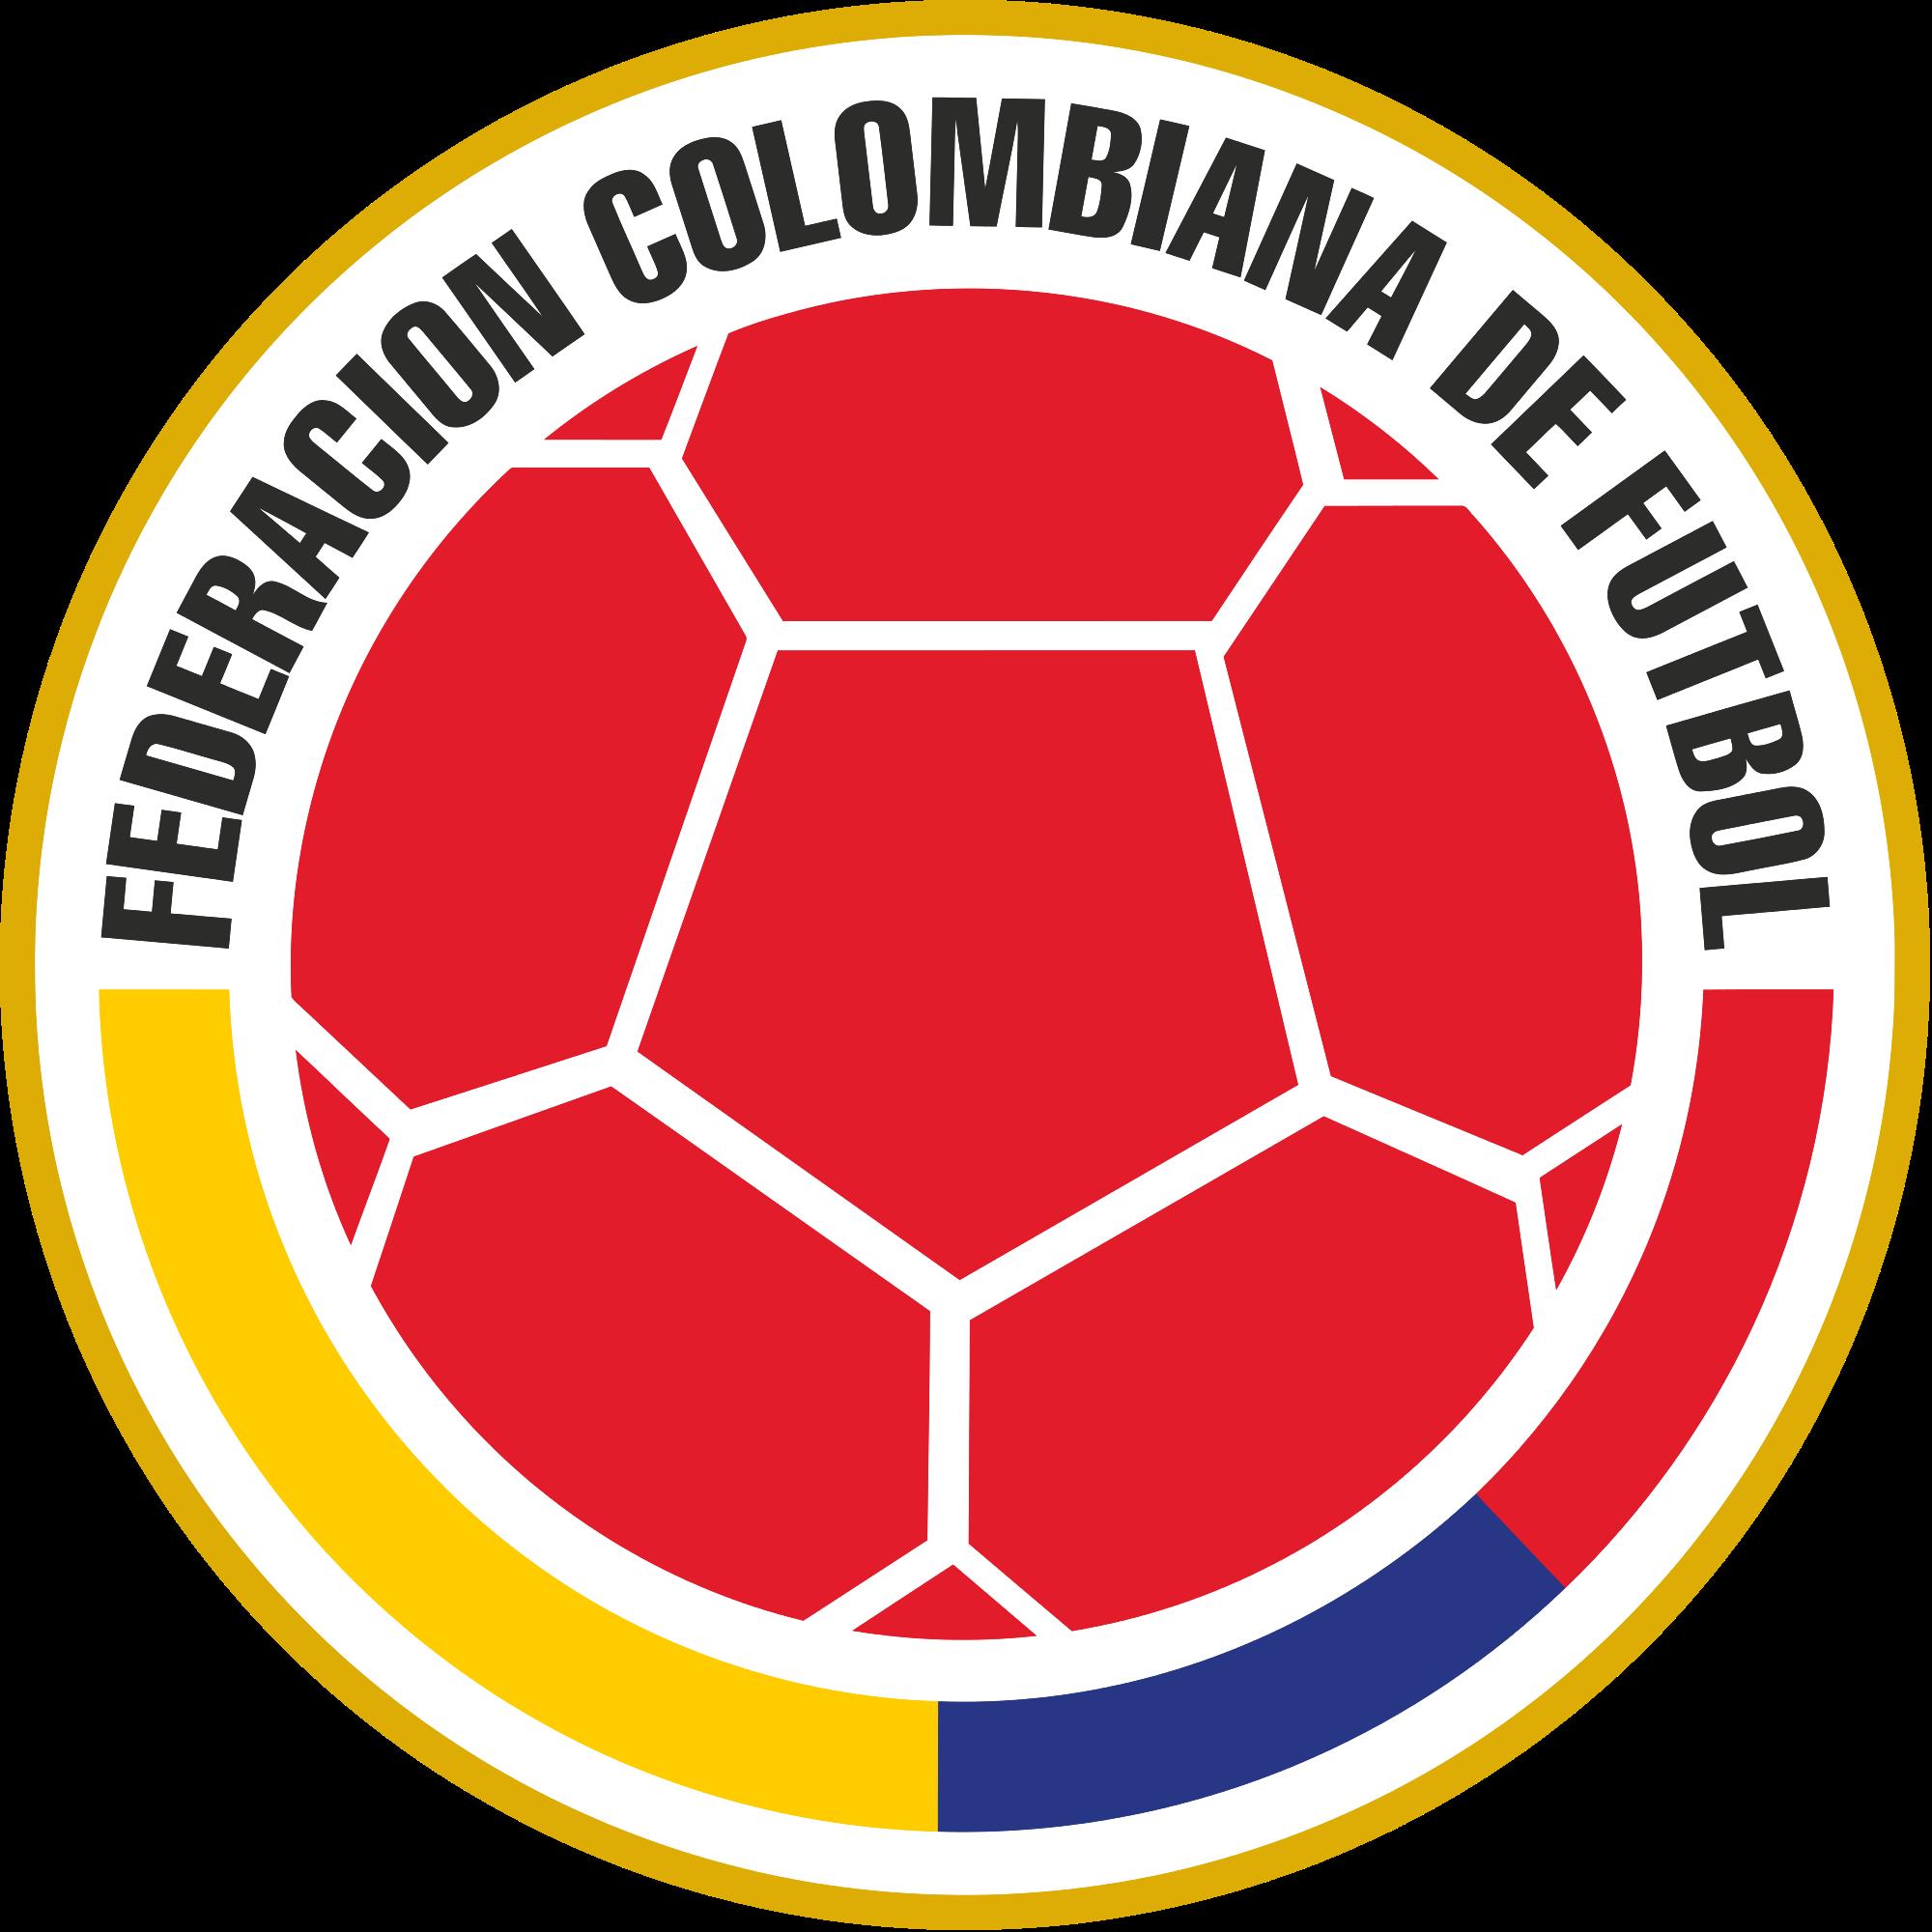 Federacion Colombiana de Futbol Futebol, Colombia